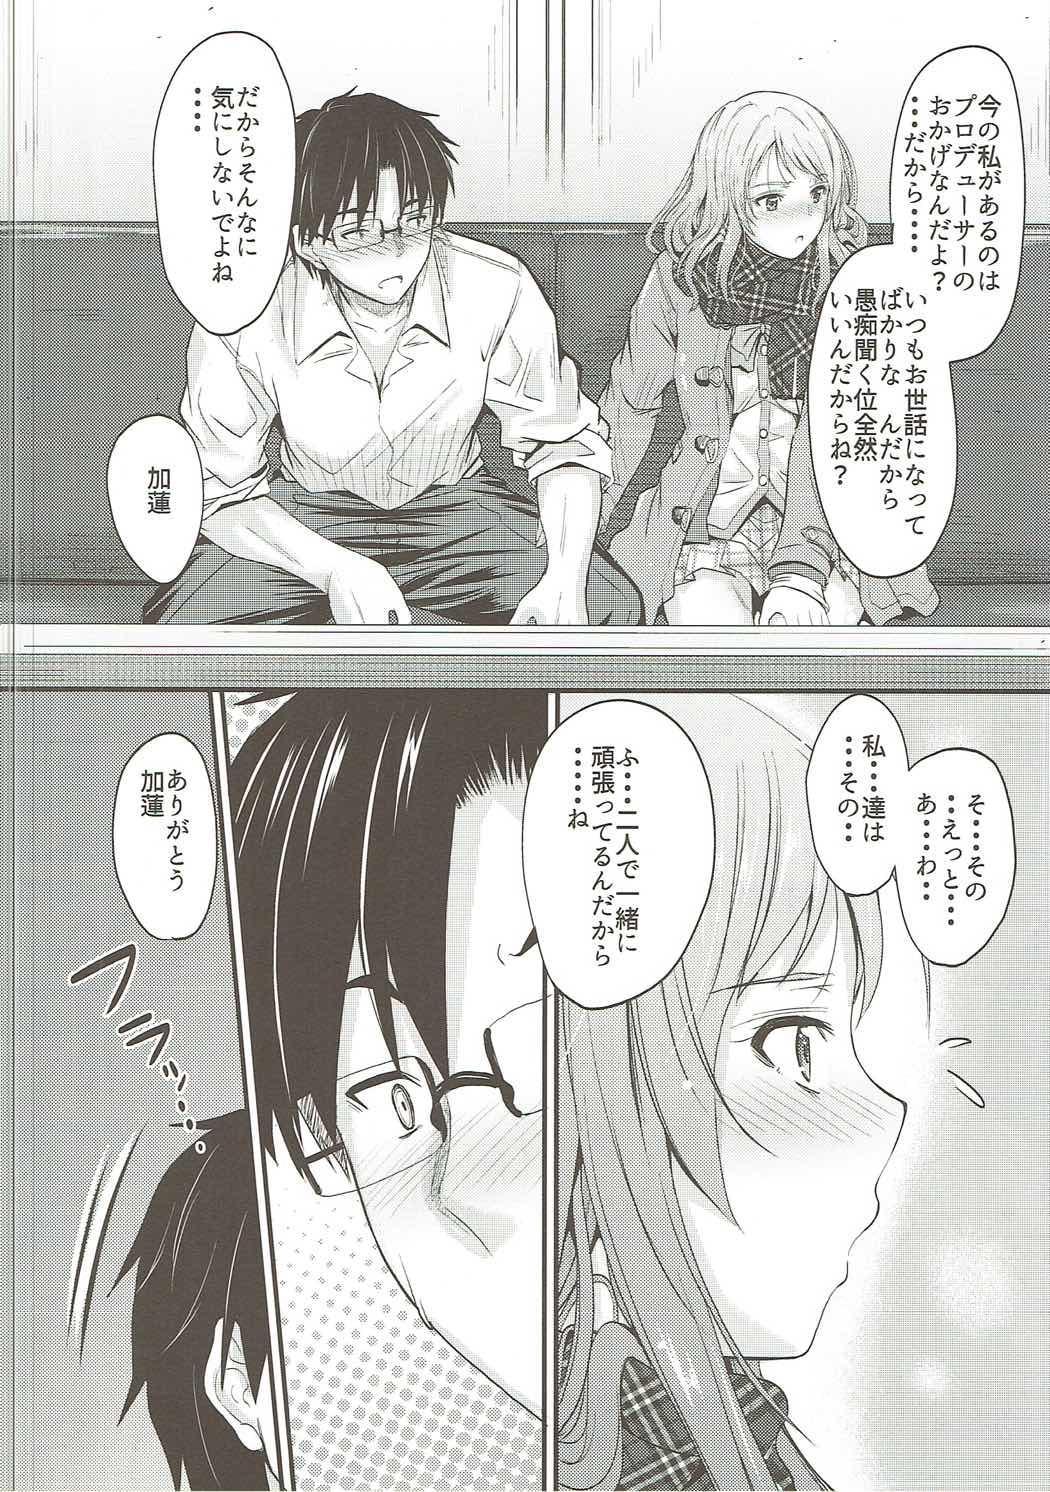 Koiiro Karen 2 6